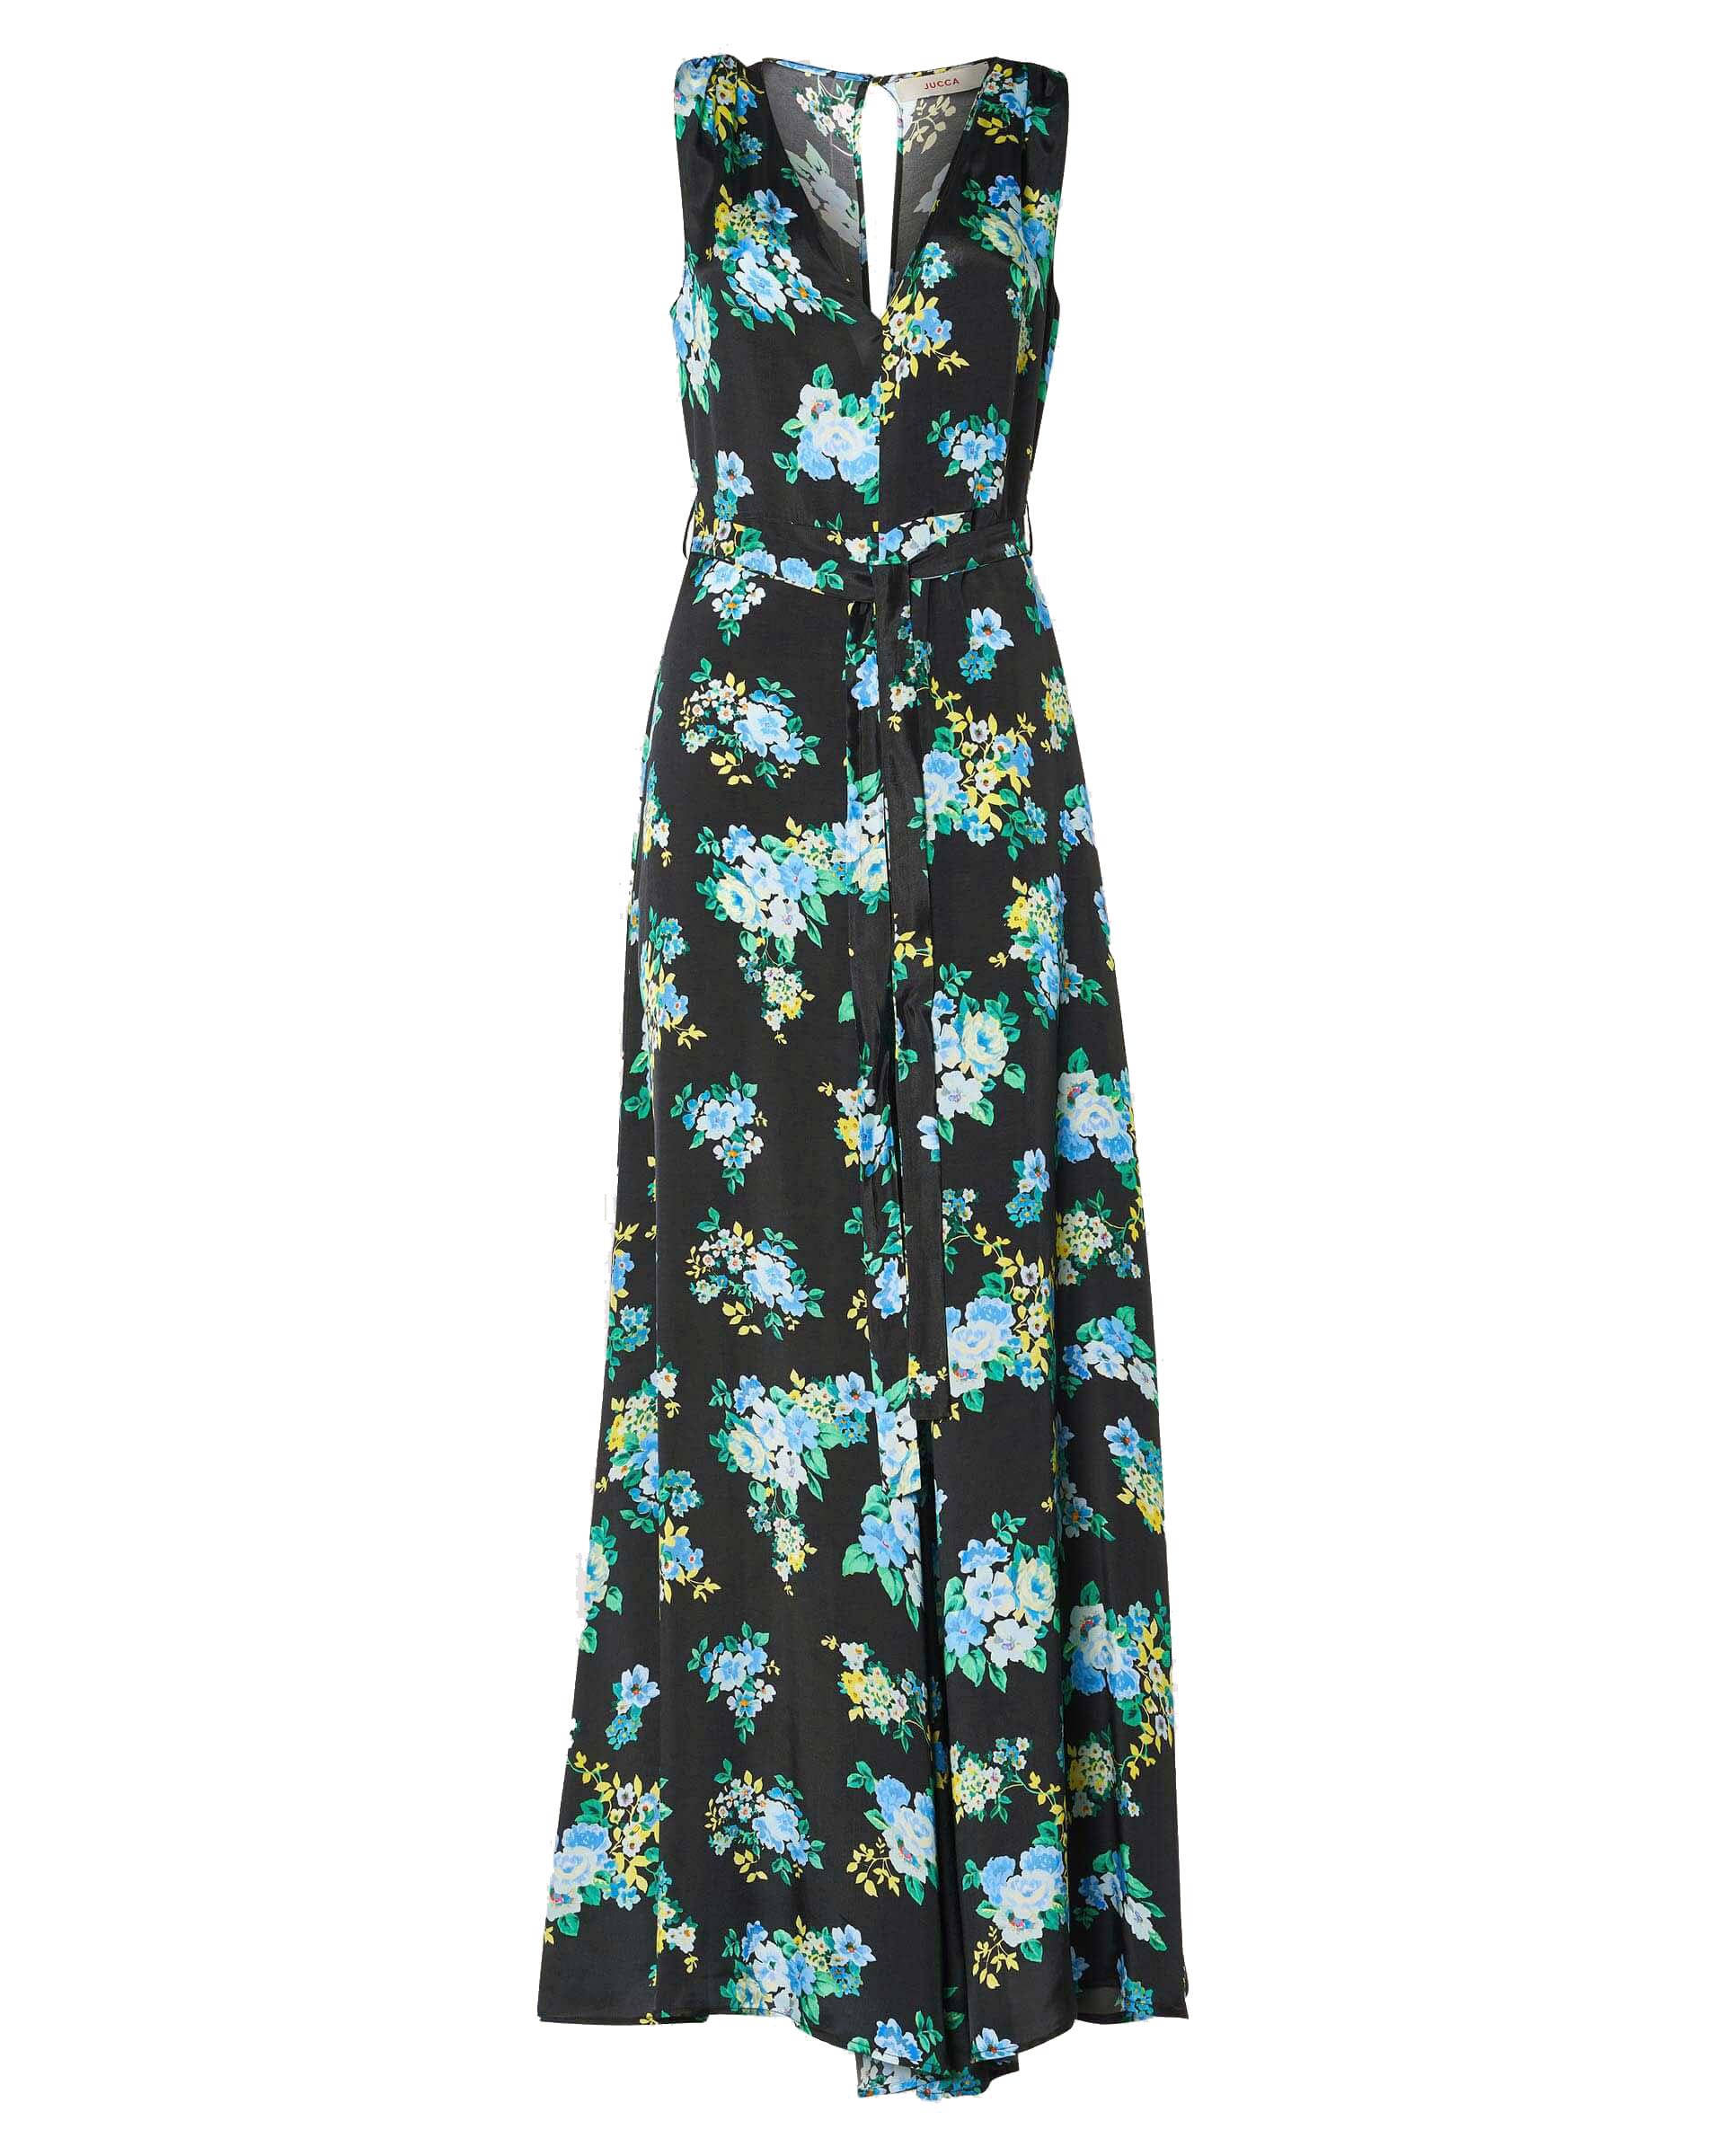 Floral viscose crepe shorts with sash JUCCA |  | J3317026003